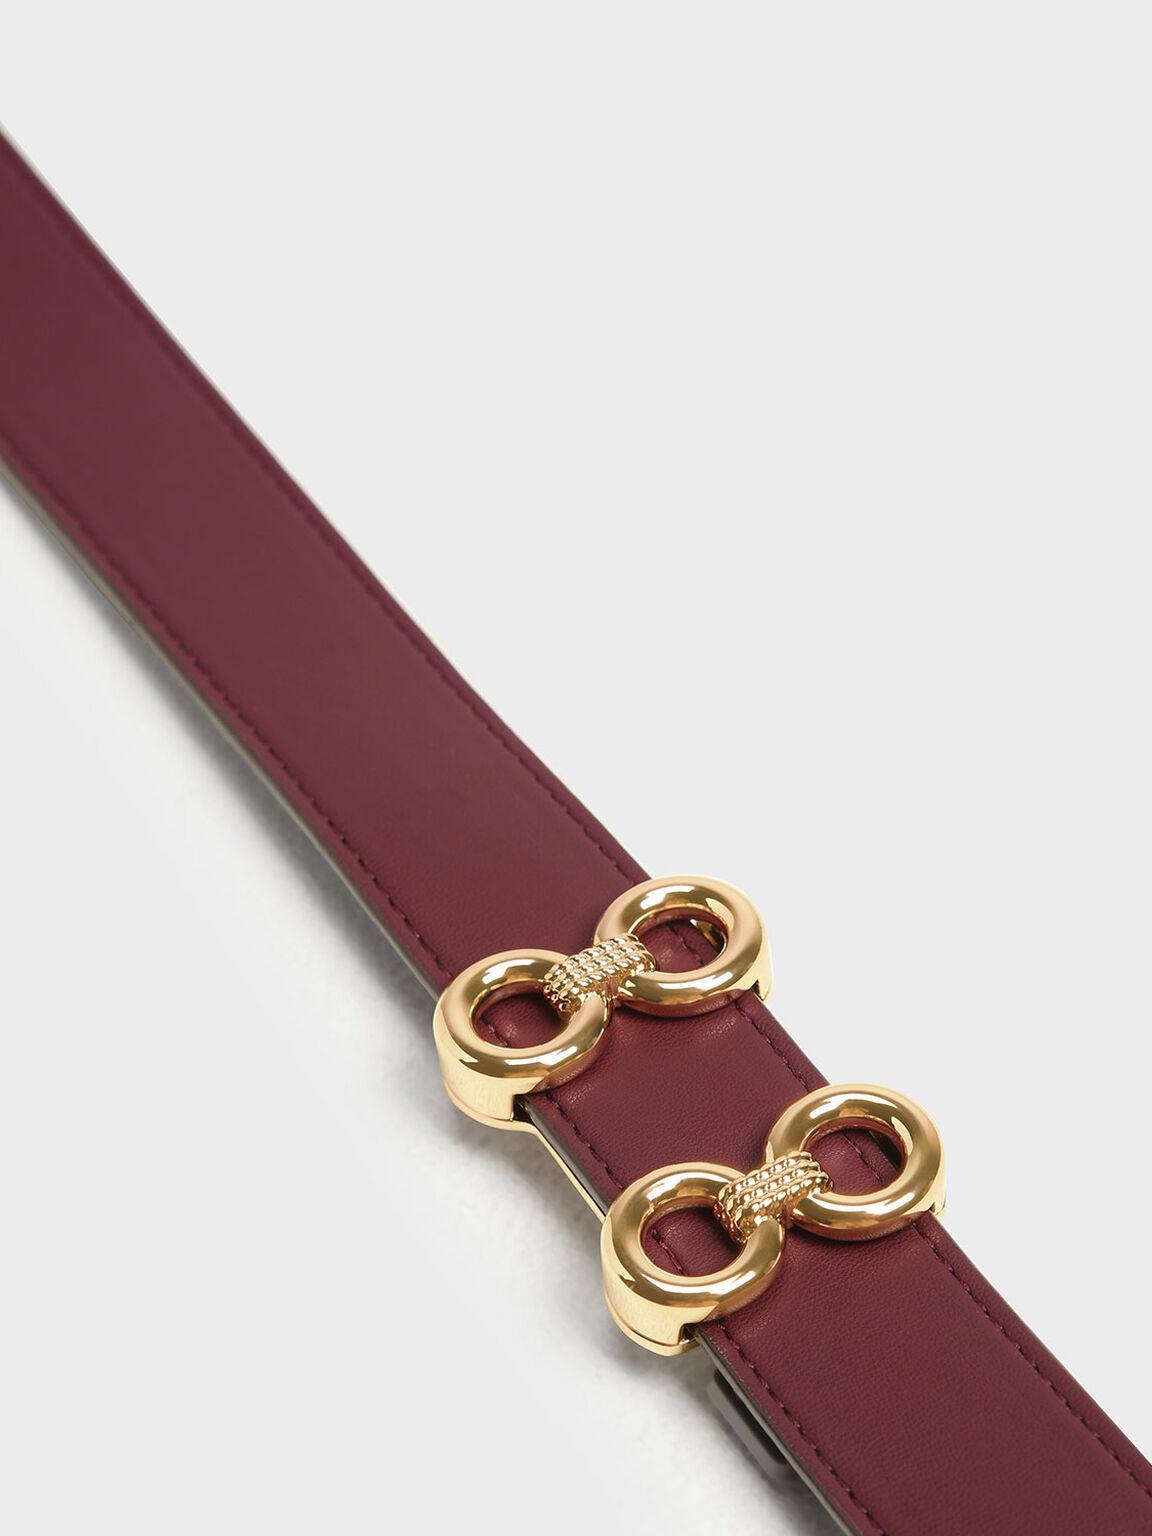 Double Buckle Belt, Burgundy, hi-res